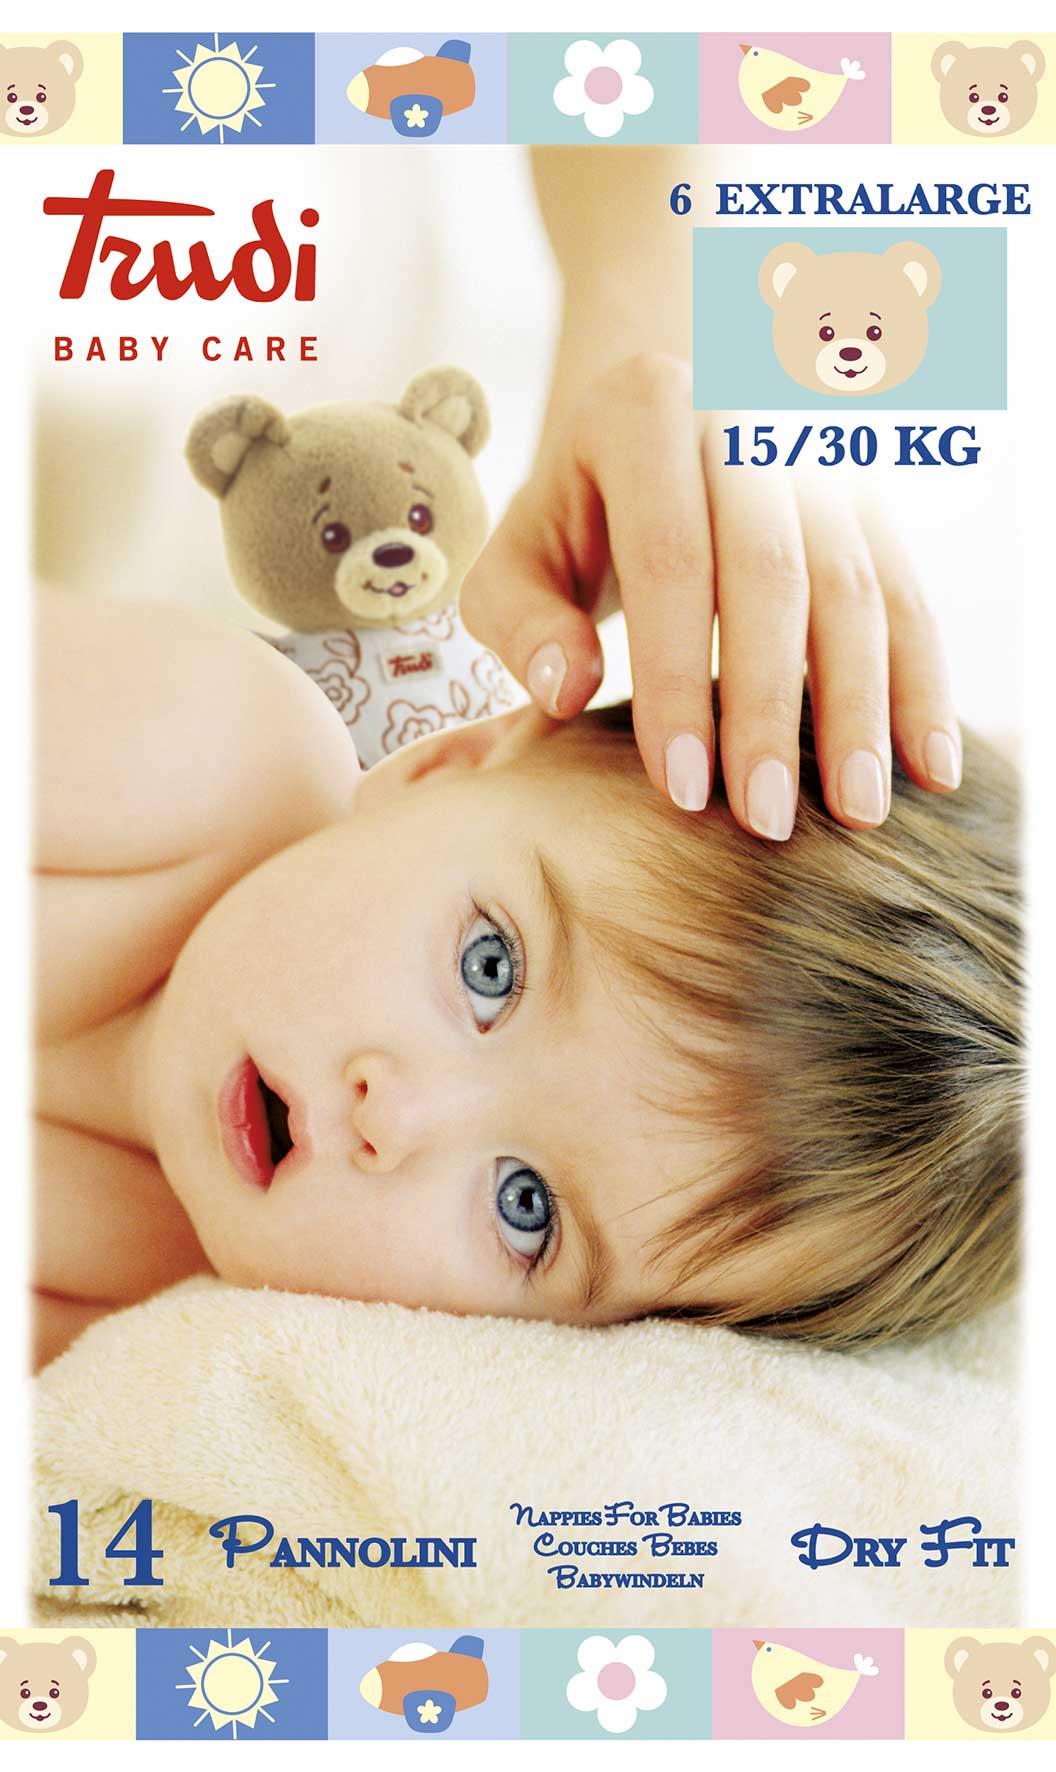 Image of Pannolini Dry Fit Taglia XL 15/30kg Trudi Baby Care 14 Pannolini